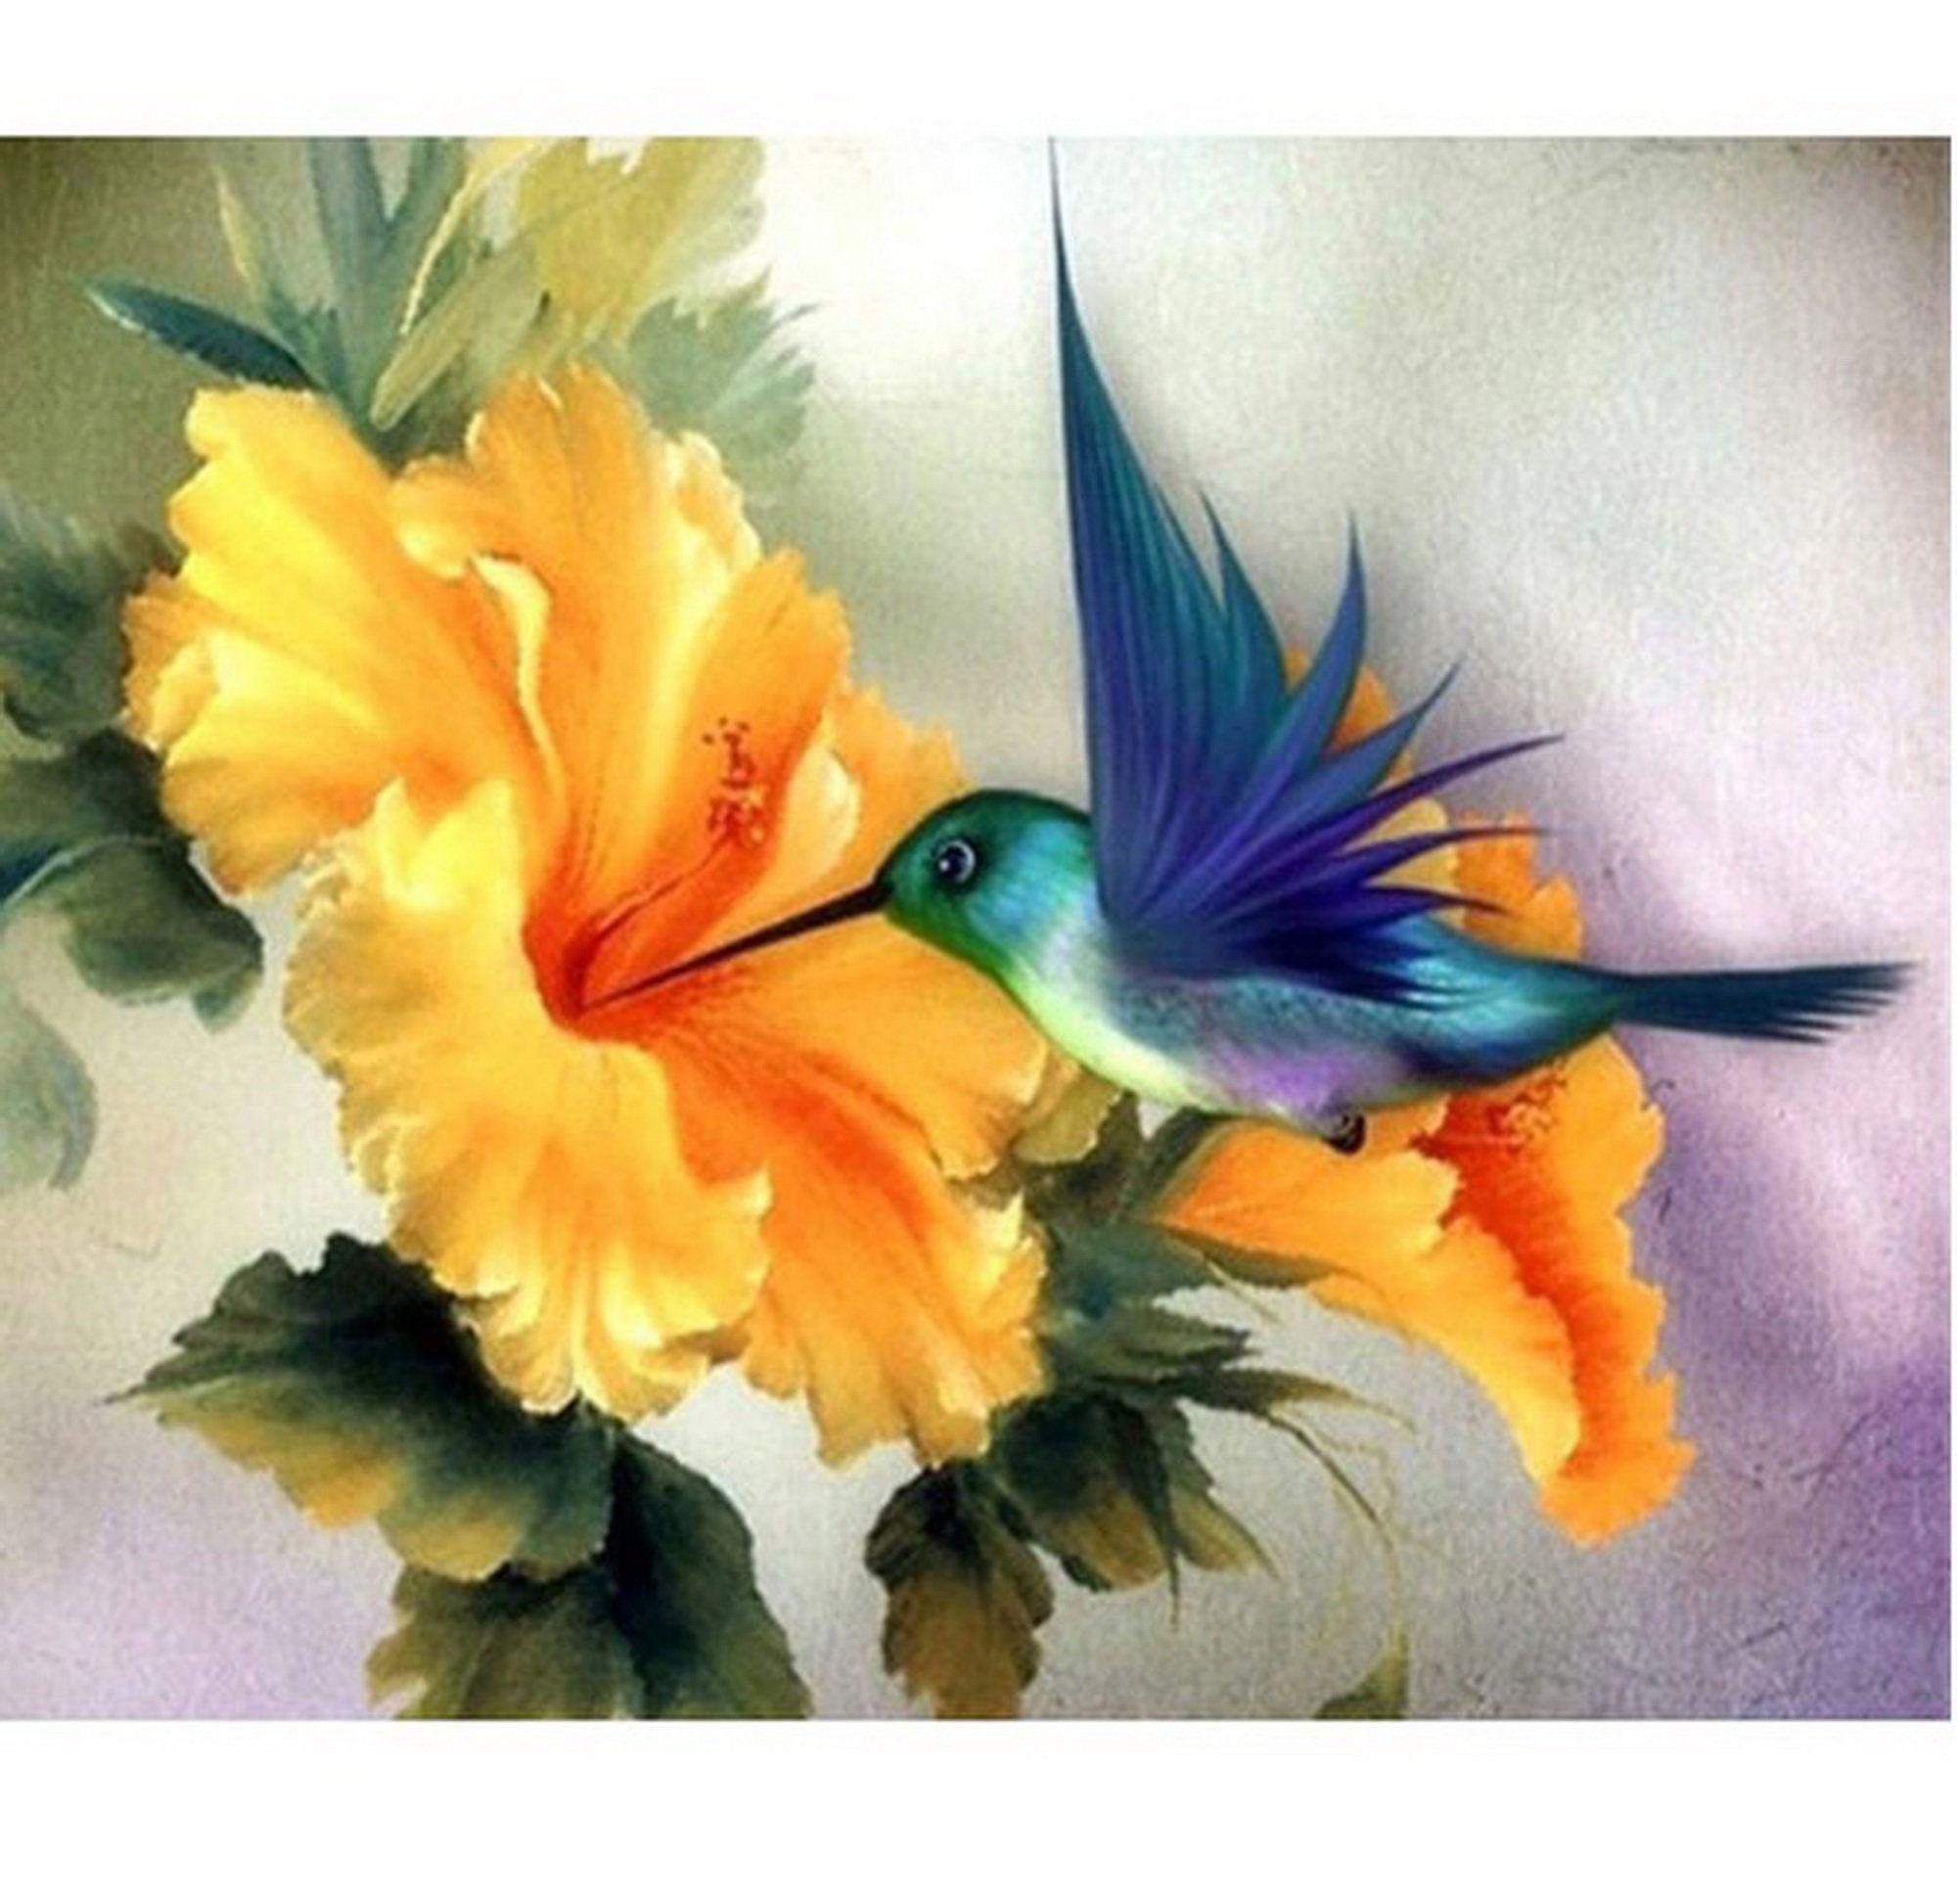 Hummingbird Paint Number kit, Home Decoration, Col